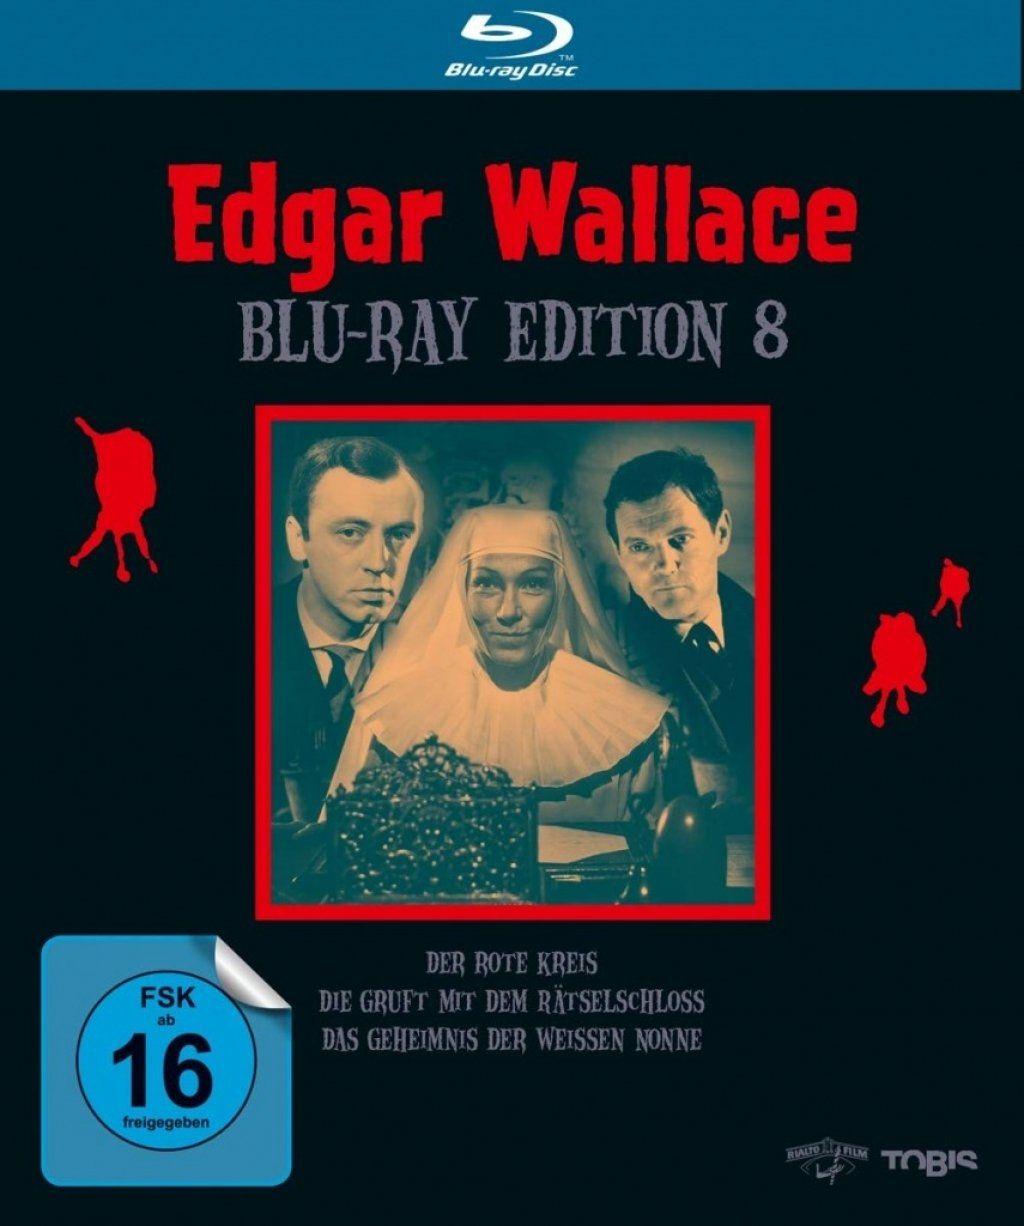 Edgar Wallace - Edition 8 (3 Discs) (BLURAY)